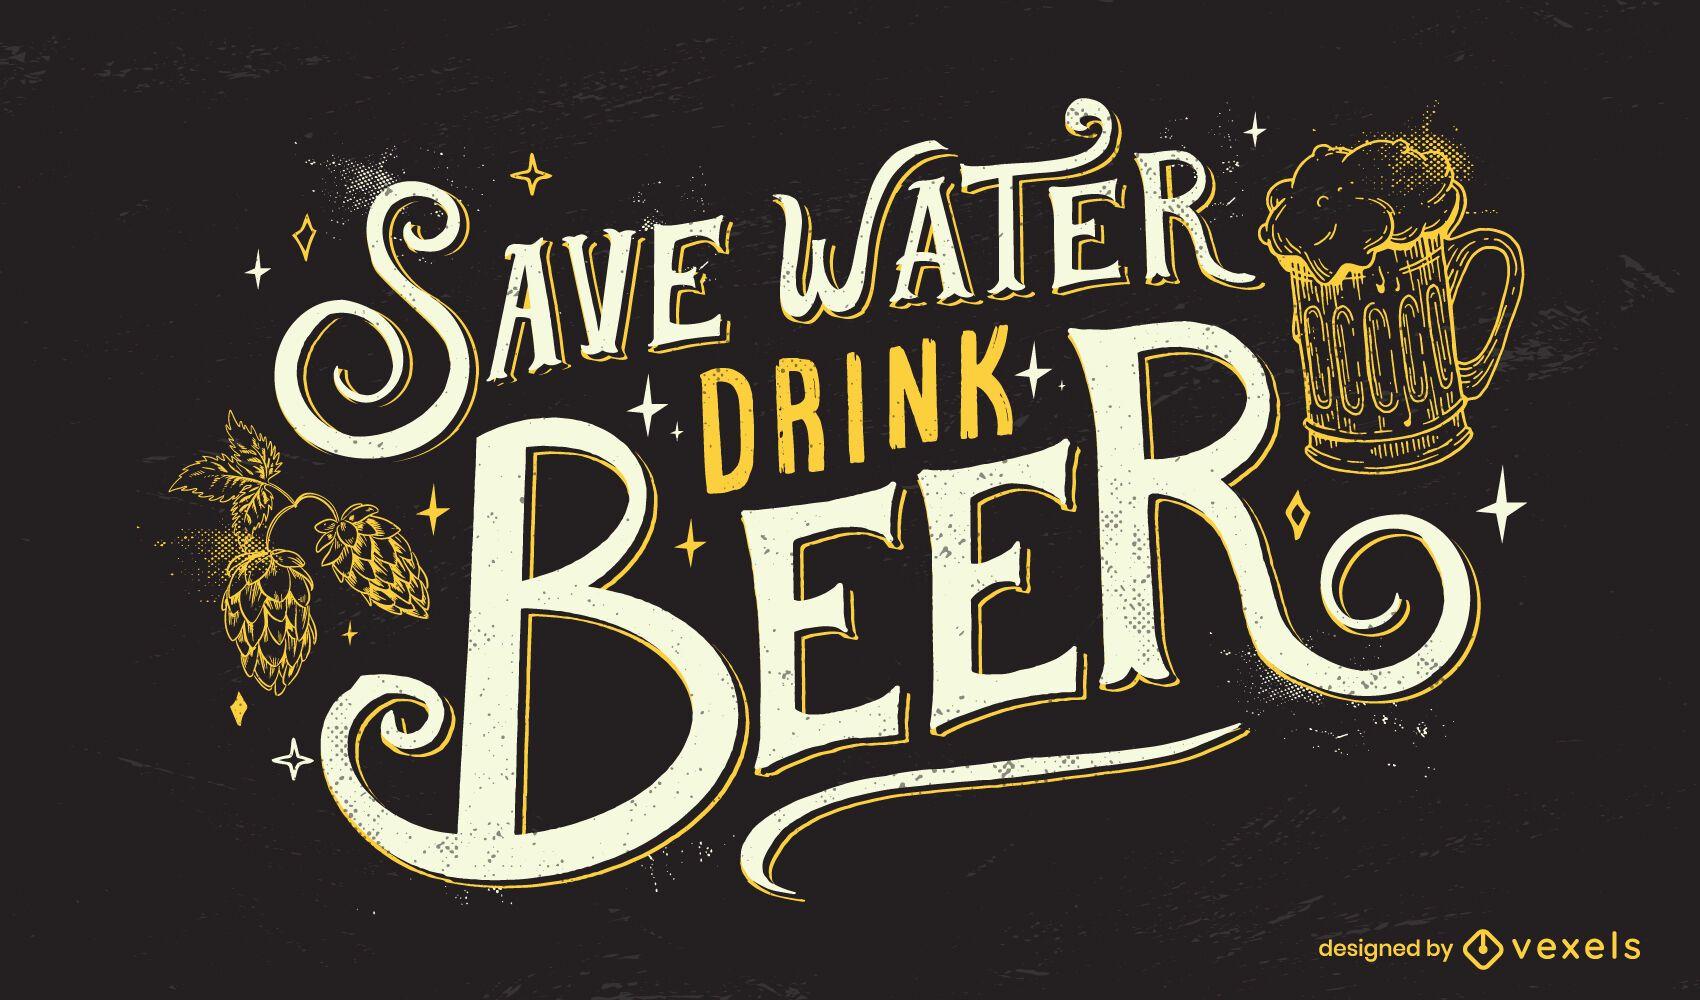 Ahorrar agua beber cerveza letras